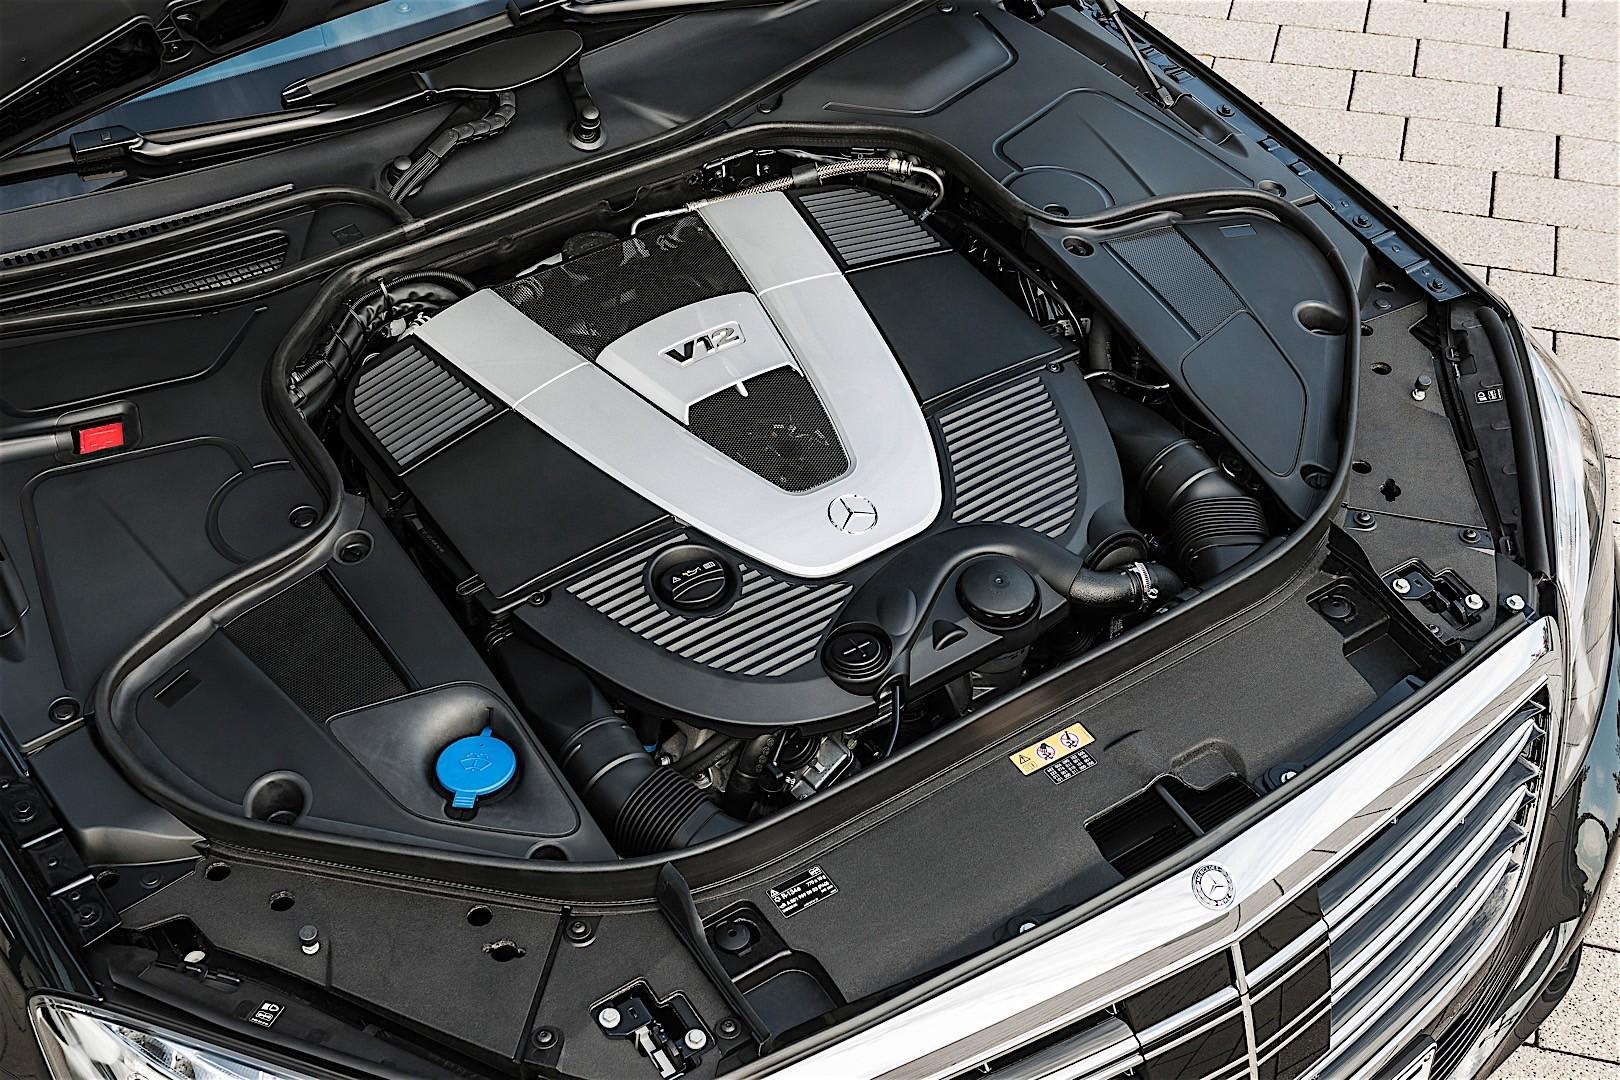 Mercedes Benz Car Battery Life